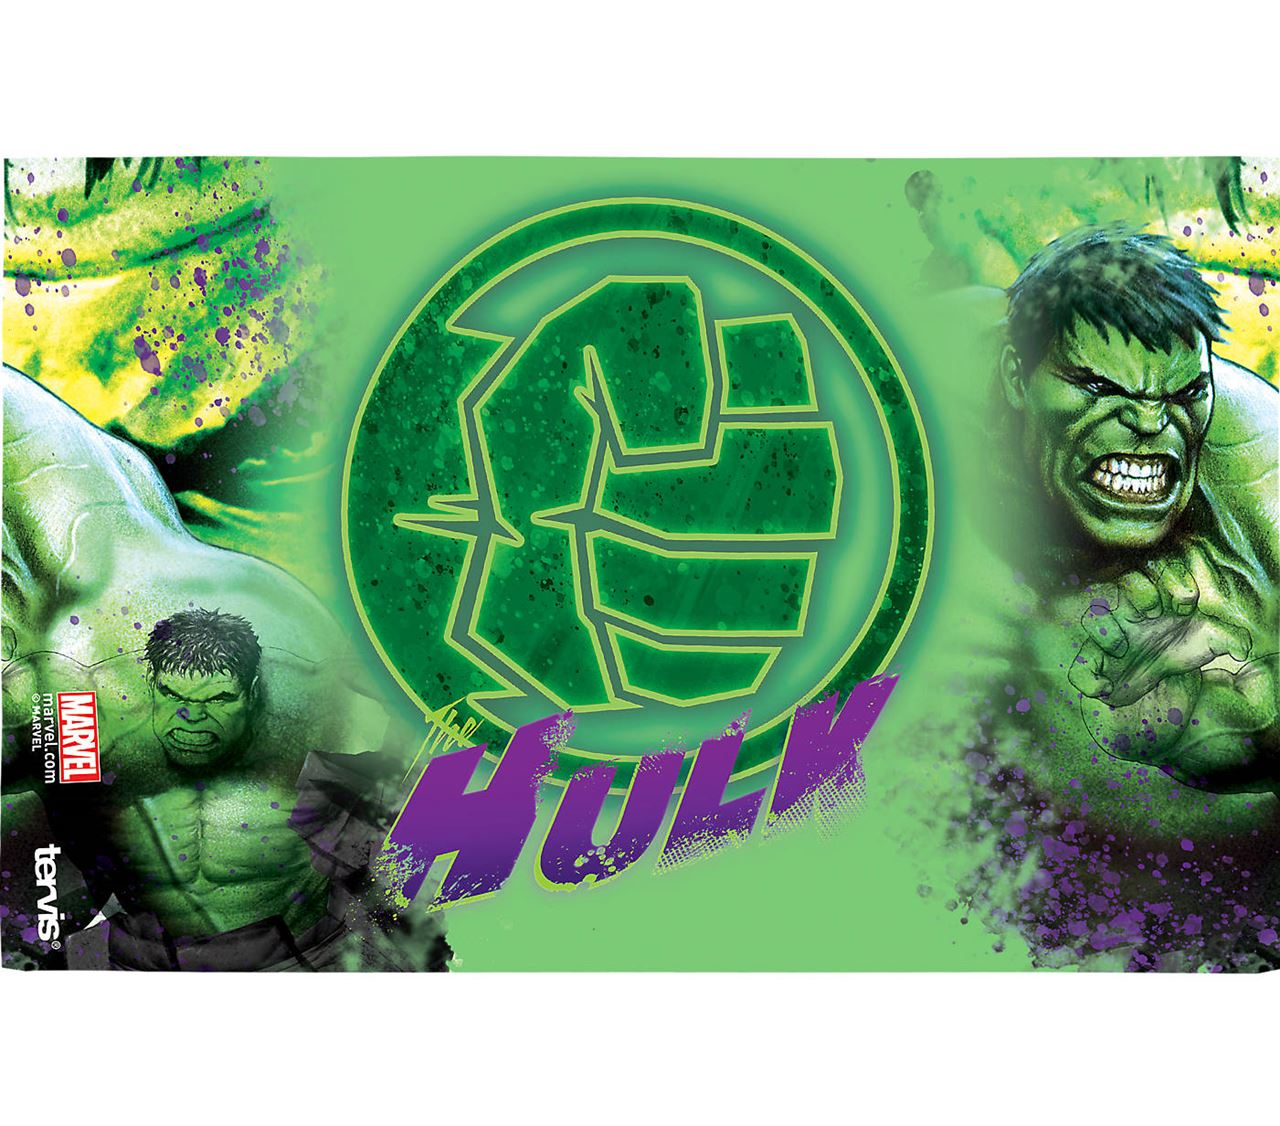 Marvel® - Hulk Wrap 16oz. Tumbler by Tervis